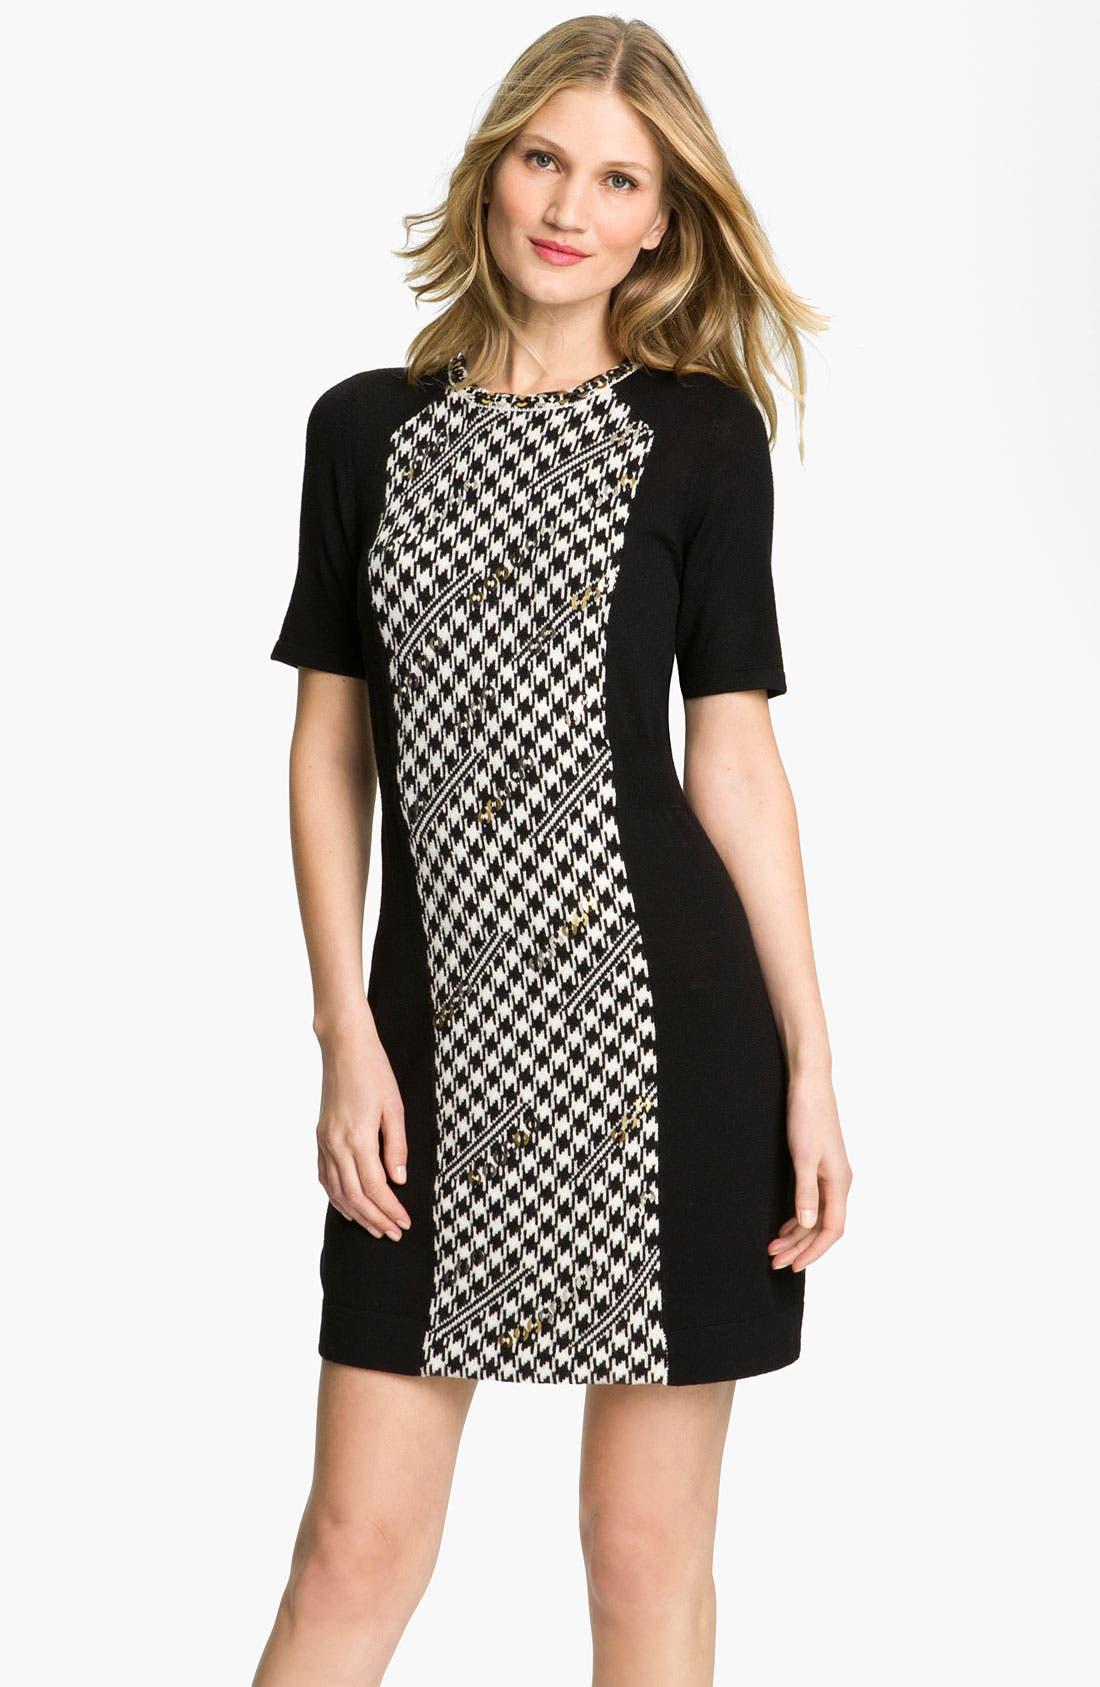 Alternate Image 1 Selected - Nanette Lepore 'Grand Prize' Merino Wool Sweater Dress